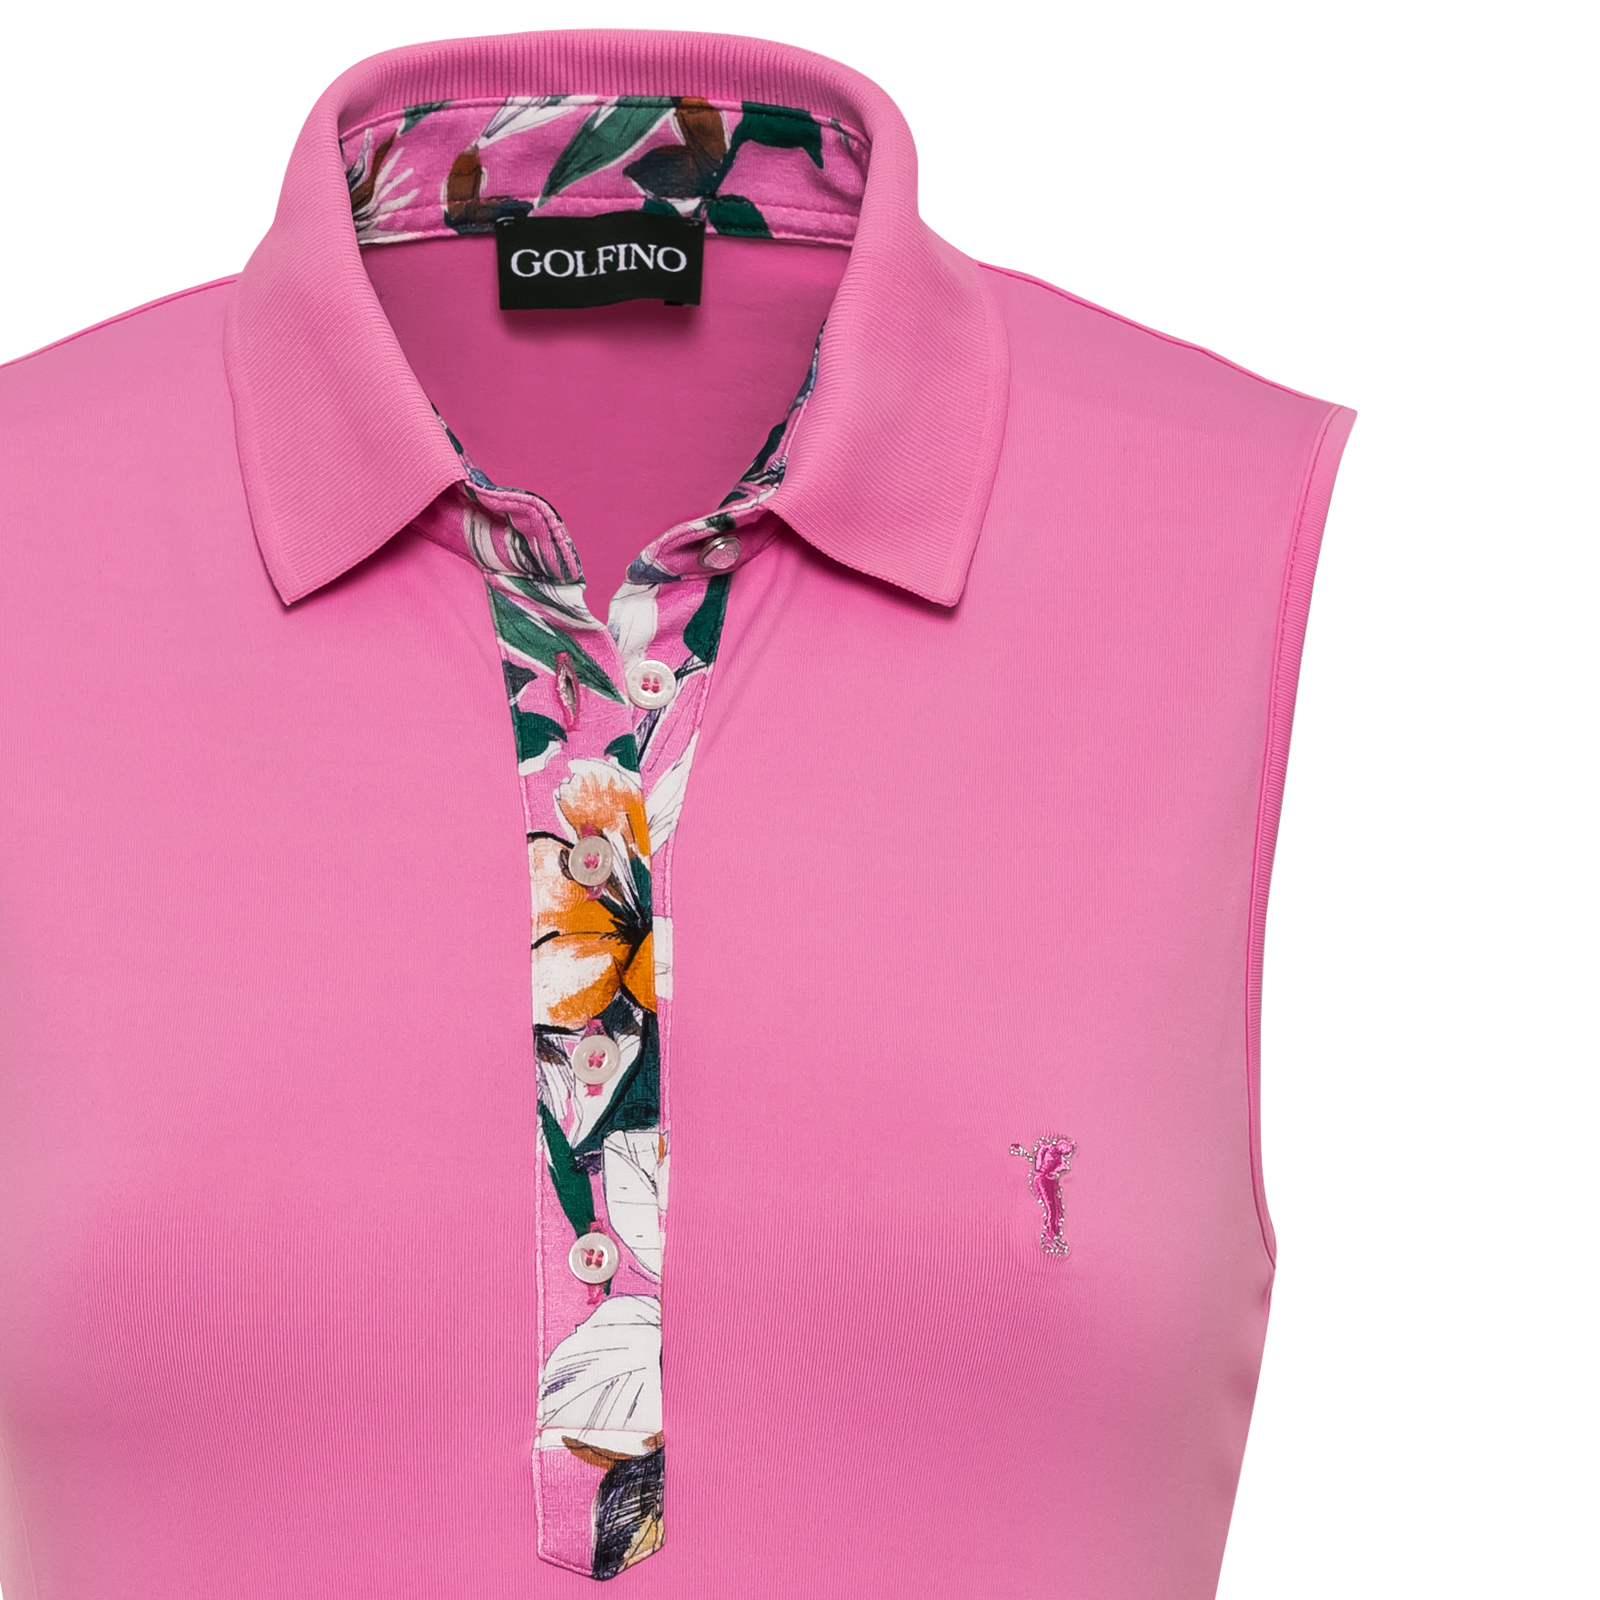 Ärmelloses Damen Golf-Polo mit DryComfort-Funktion